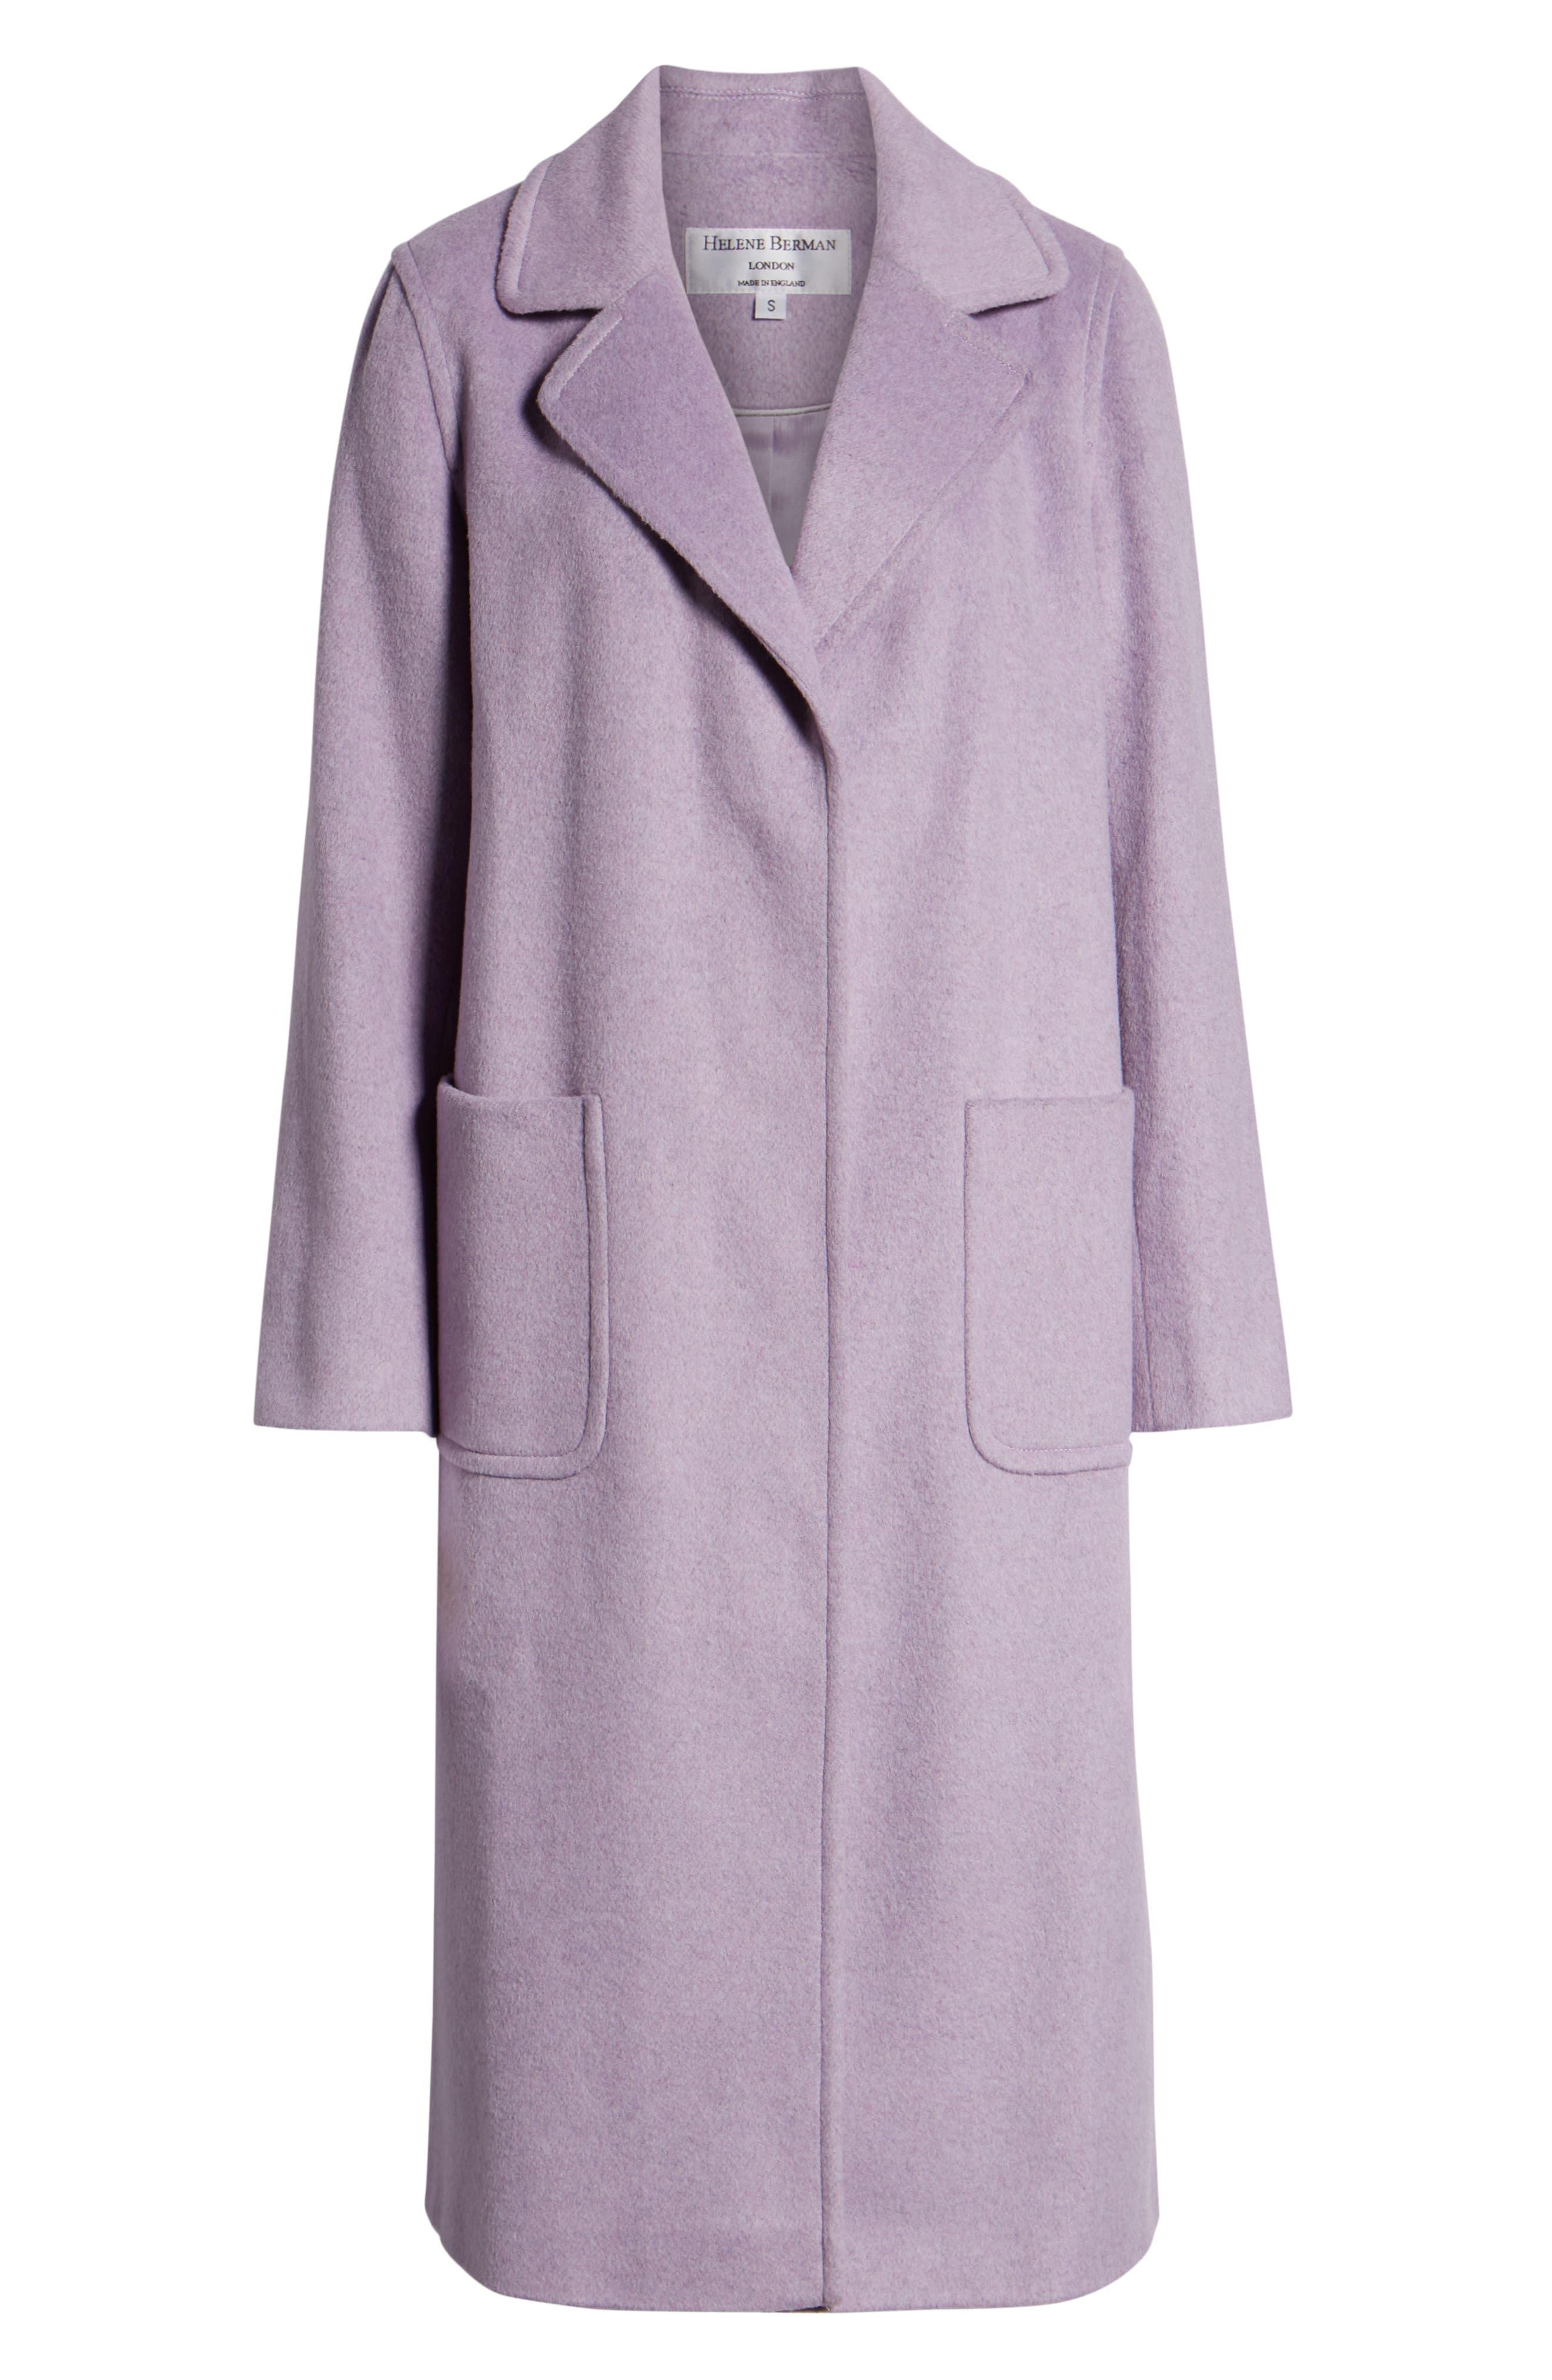 Ruth Knee Length Coat,                             Alternate thumbnail 6, color,                             500